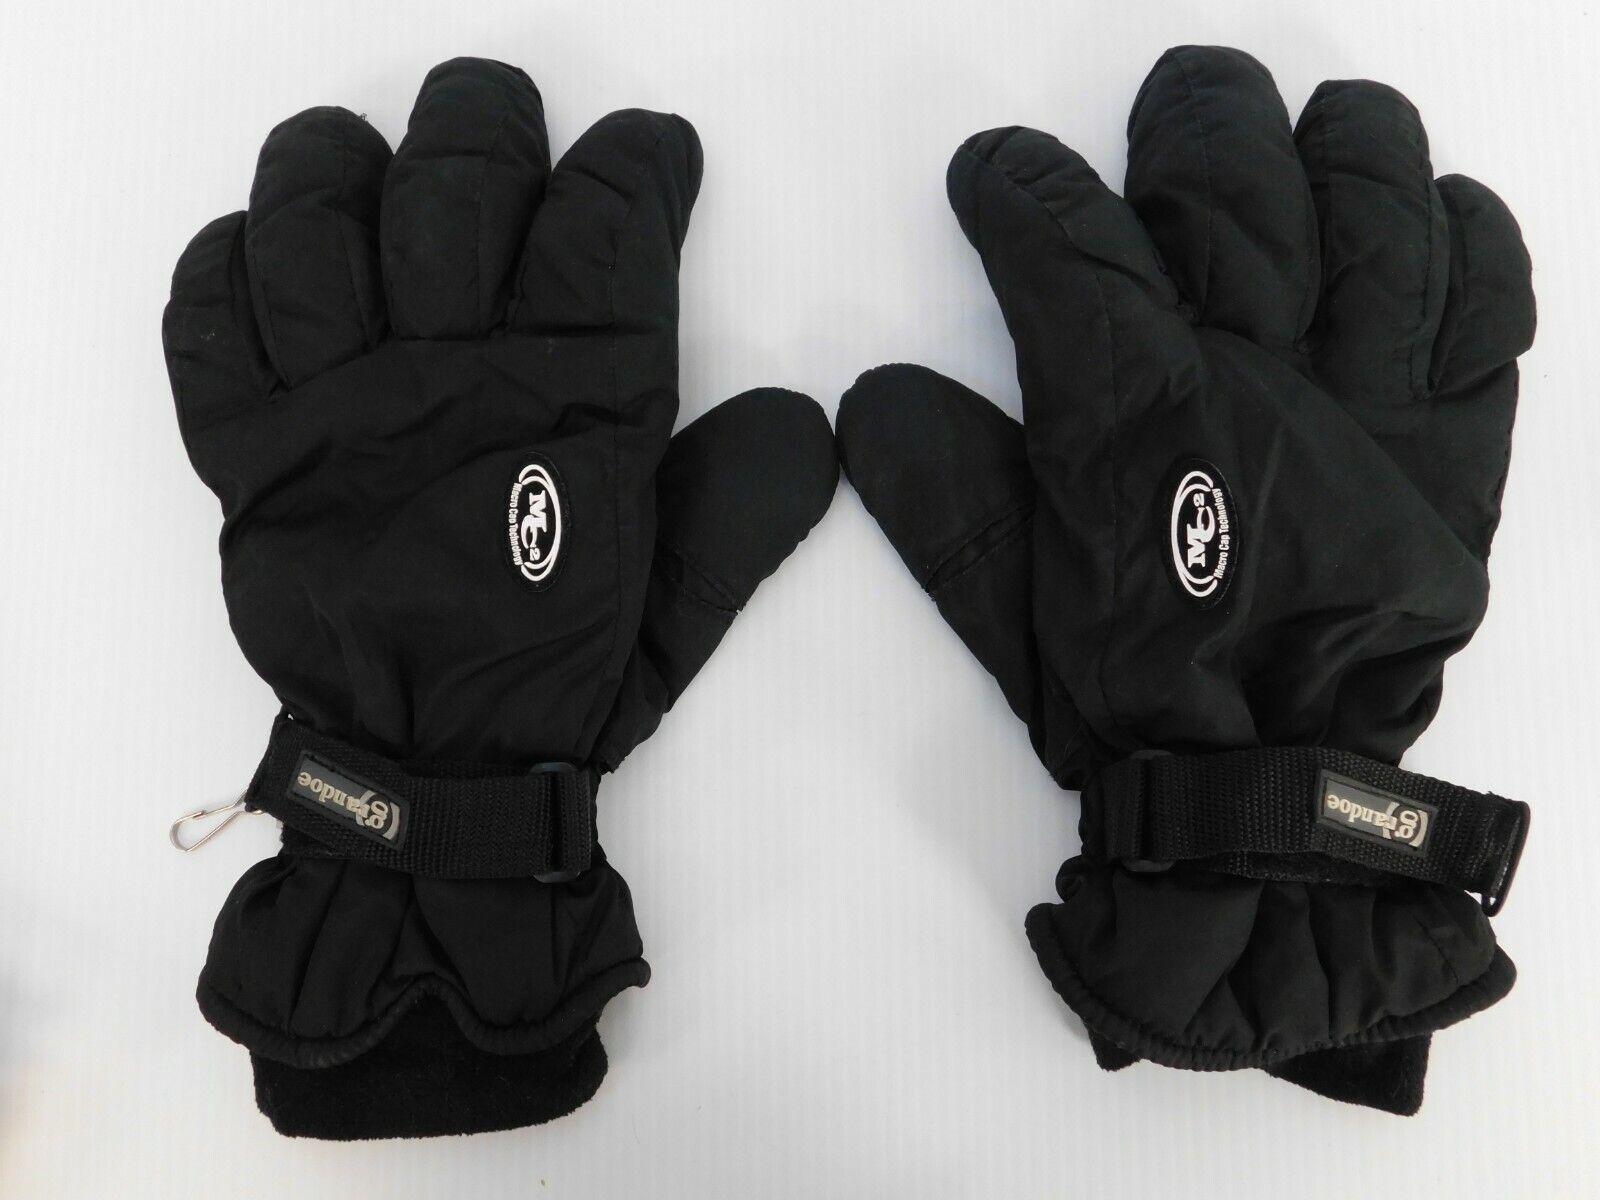 Grandoe Men's Gloves MC2 Macro Cap Technology Size L Primaloft